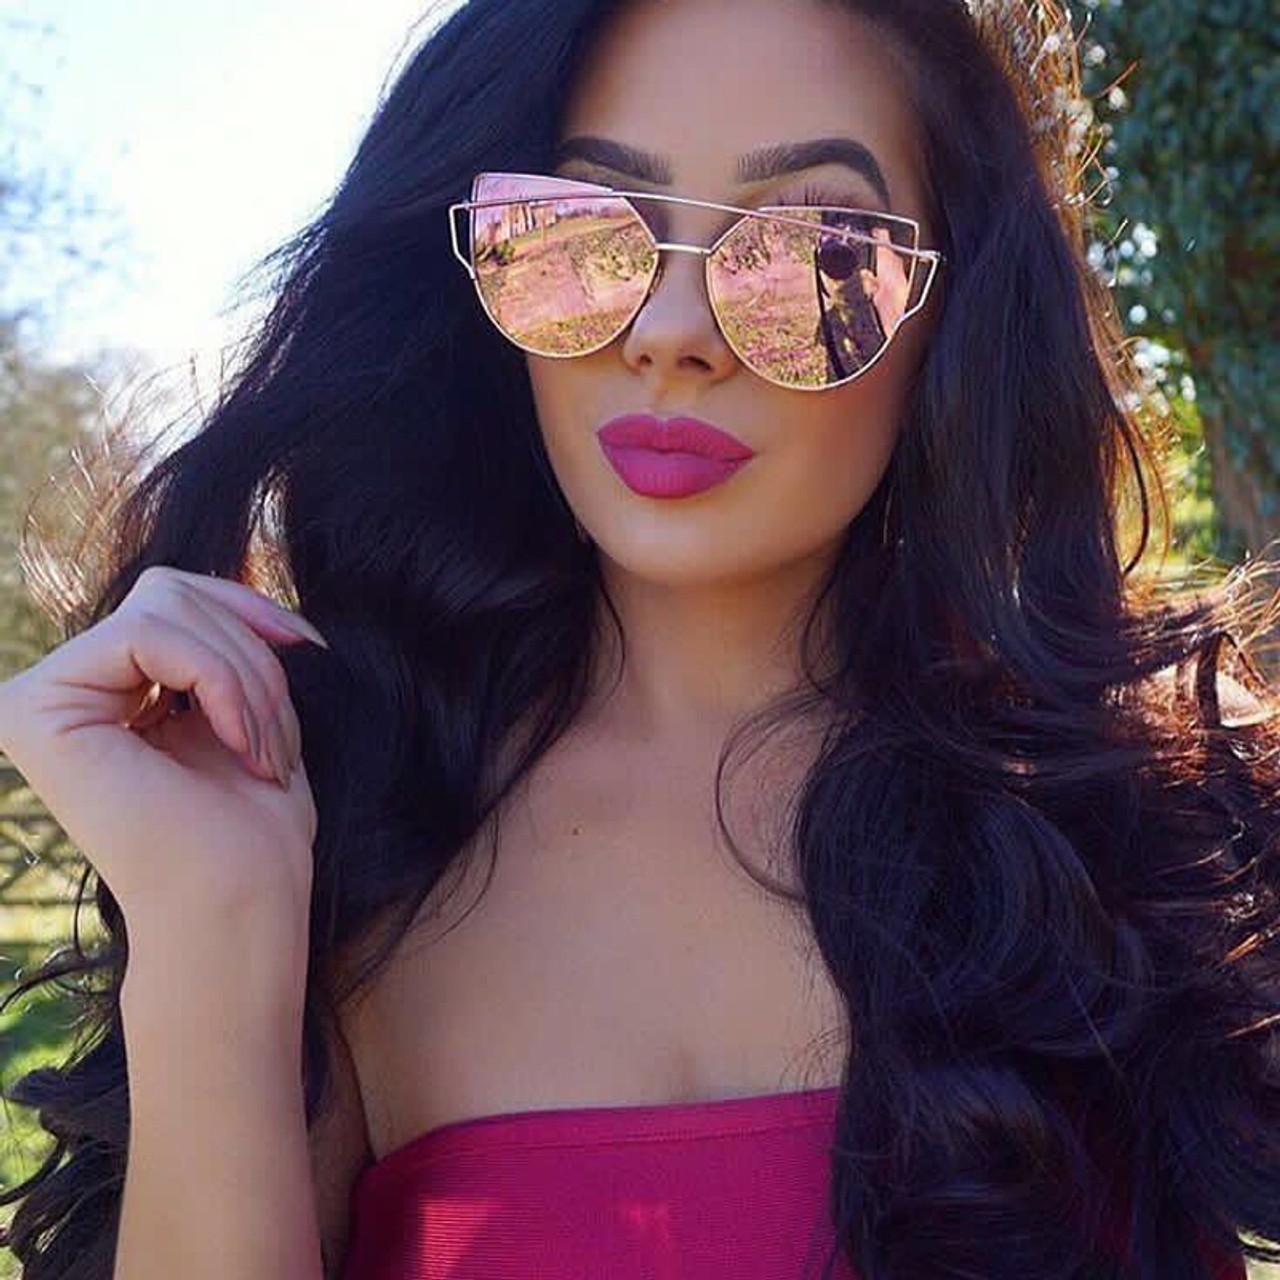 ee91fd6a4a Newest Cat Eye Sunglasses Women Brand Designer Twin-Beams Sun Glasses  Mirror Sunglasses Flat Panel Love Punch Clear Drop Ship - OnshopDeals.Com